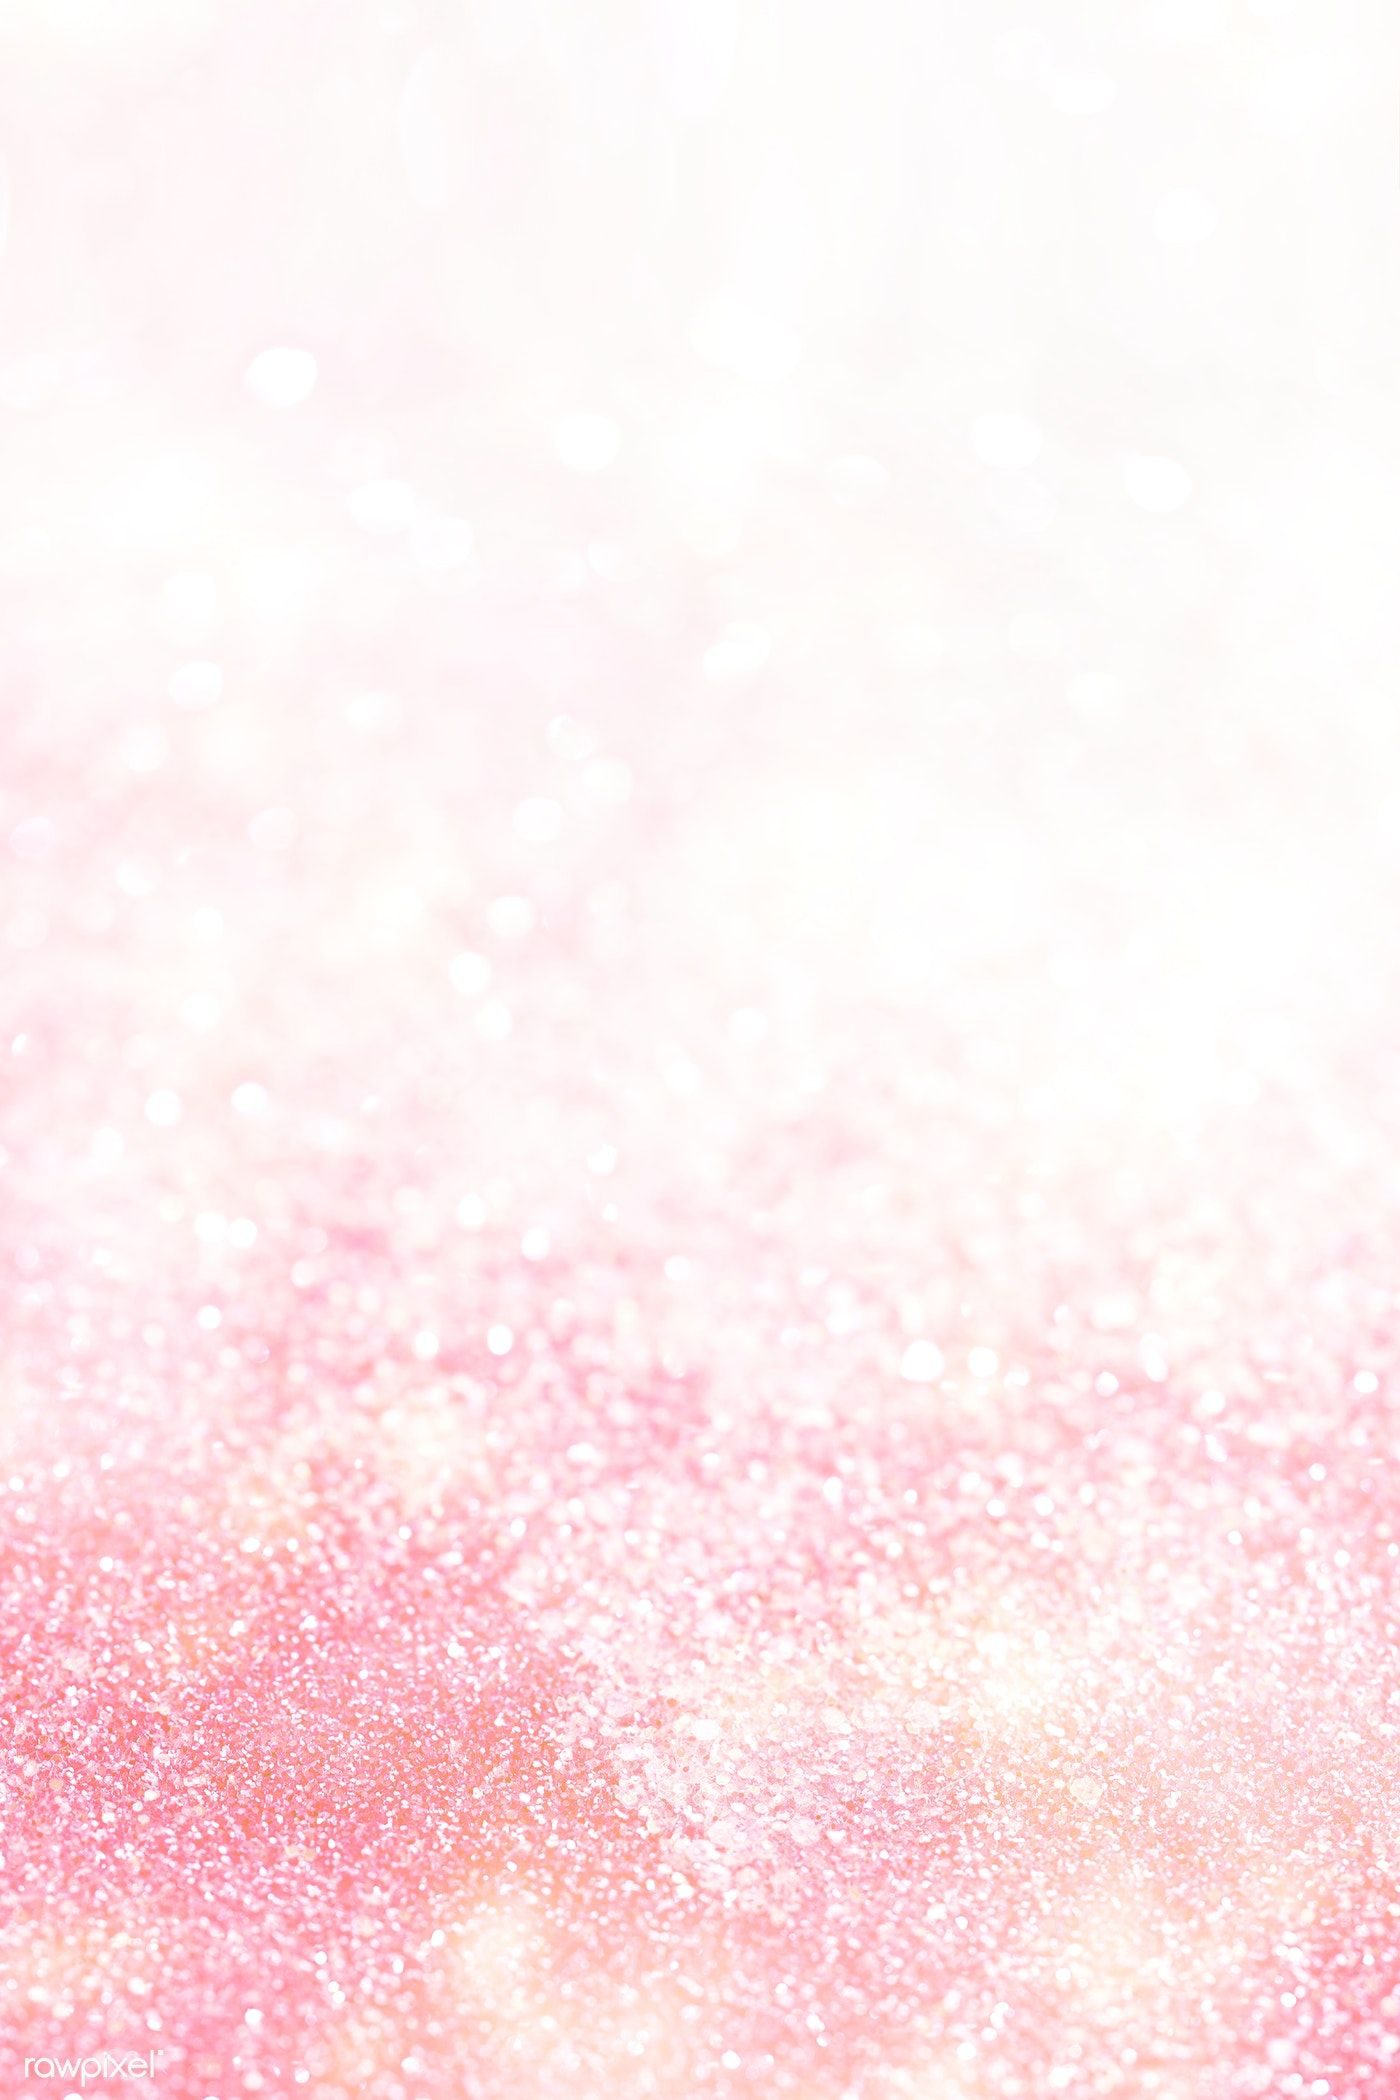 Download Premium Image Of Light Pink Glitter Gradient Background 2281074 Pink Glitter Background Pink Sparkle Background Pink Sparkle Wallpaper